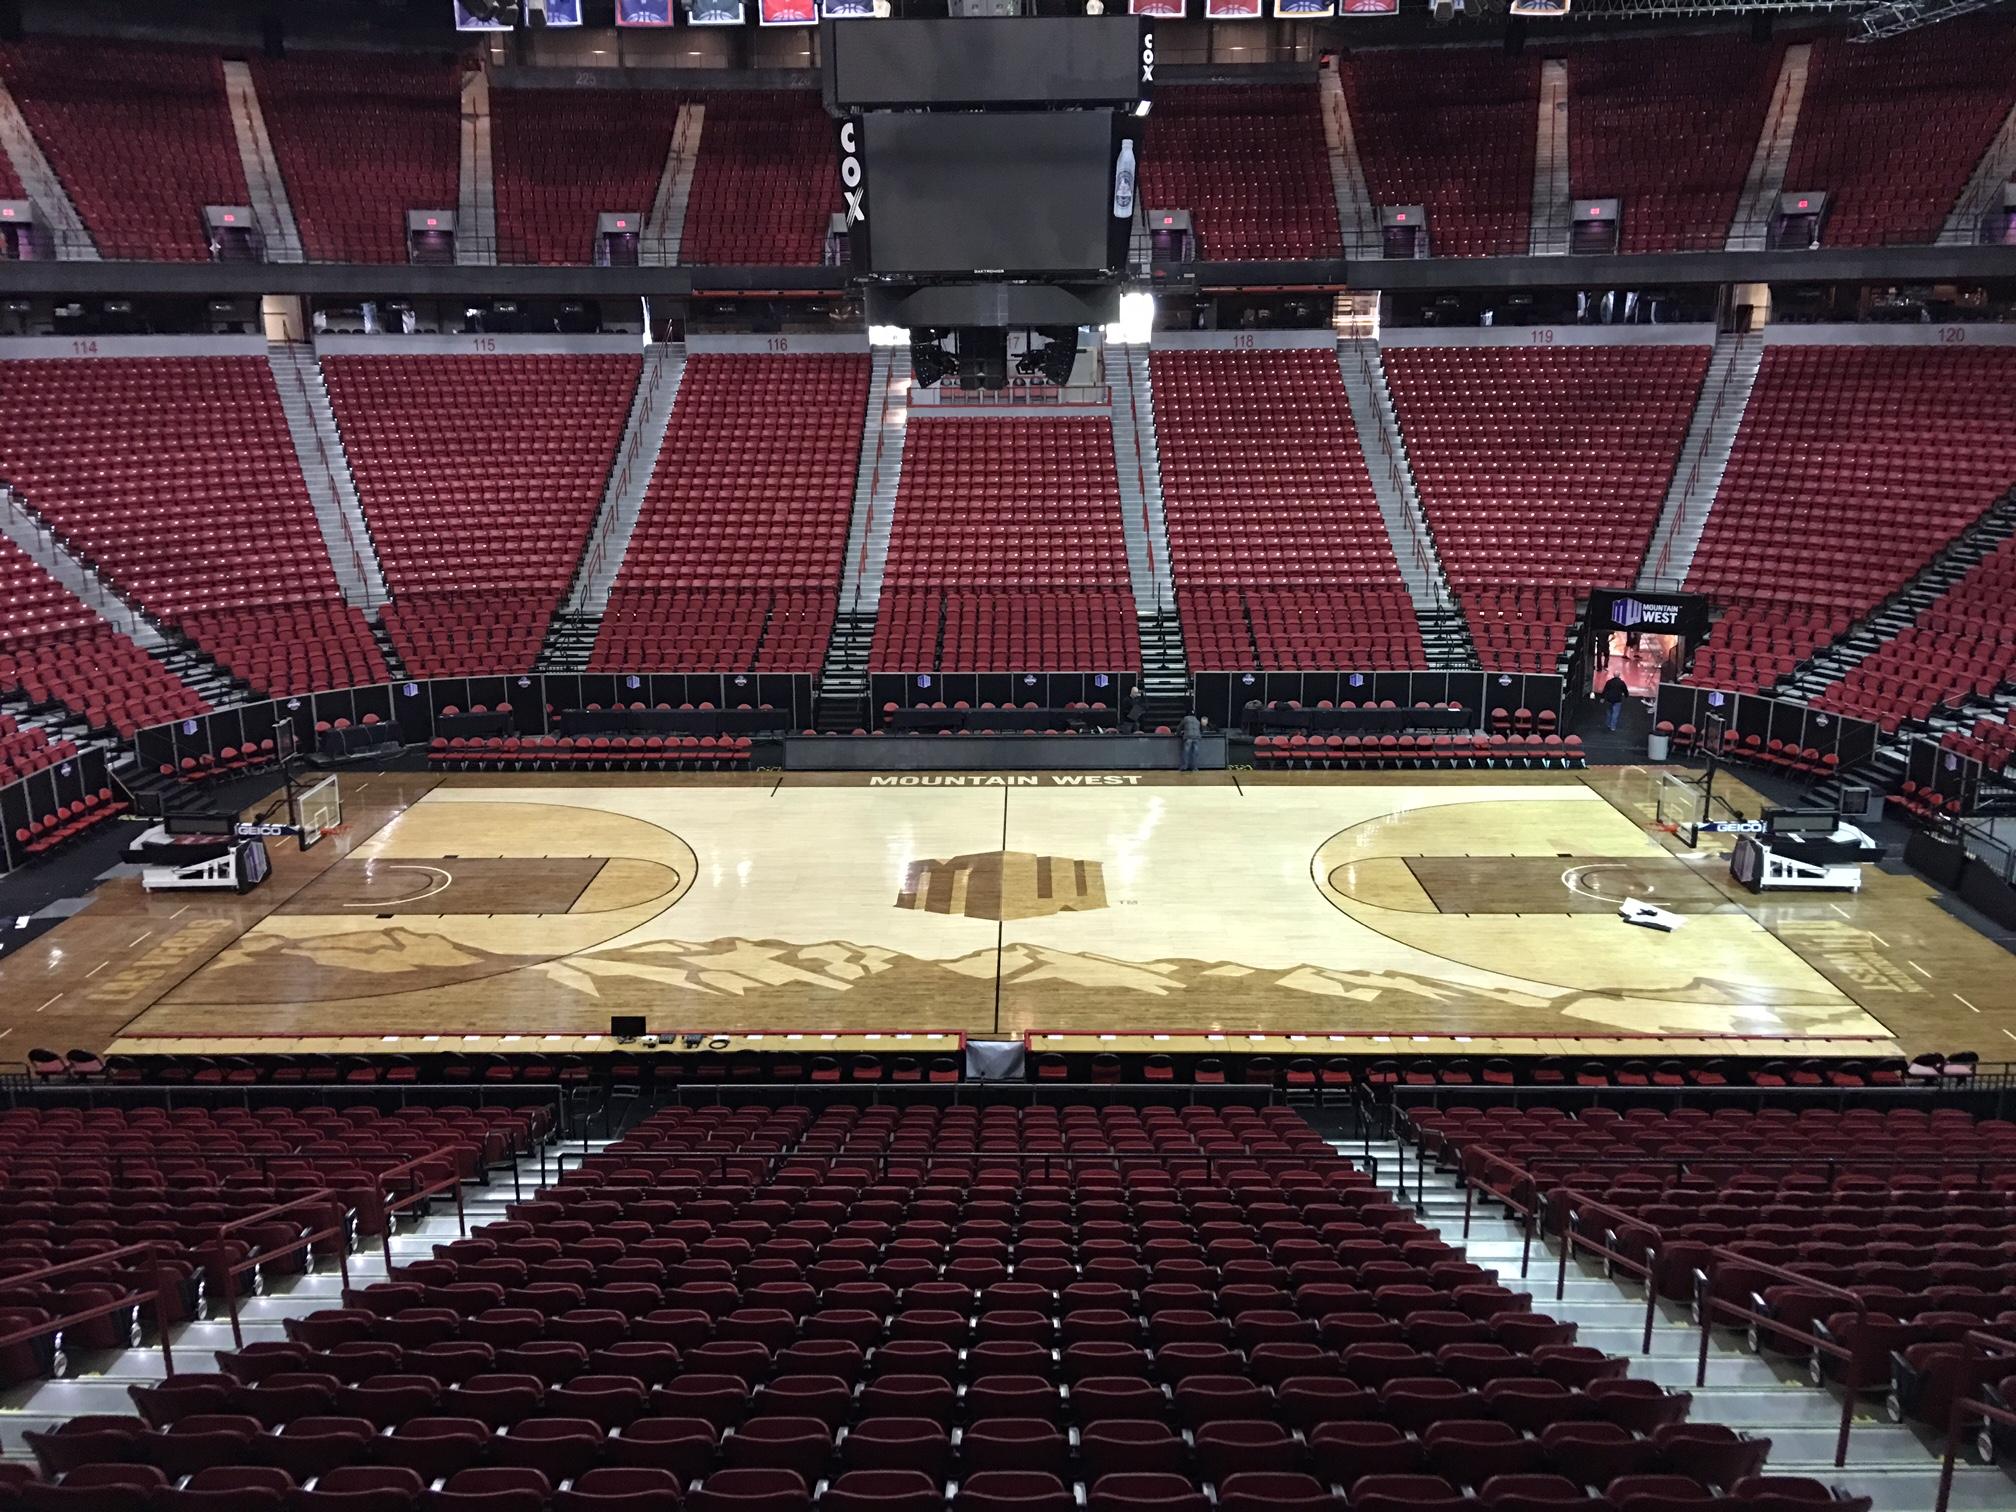 Connor sports flooring ncaa gurus floor for Basketball court installation cost